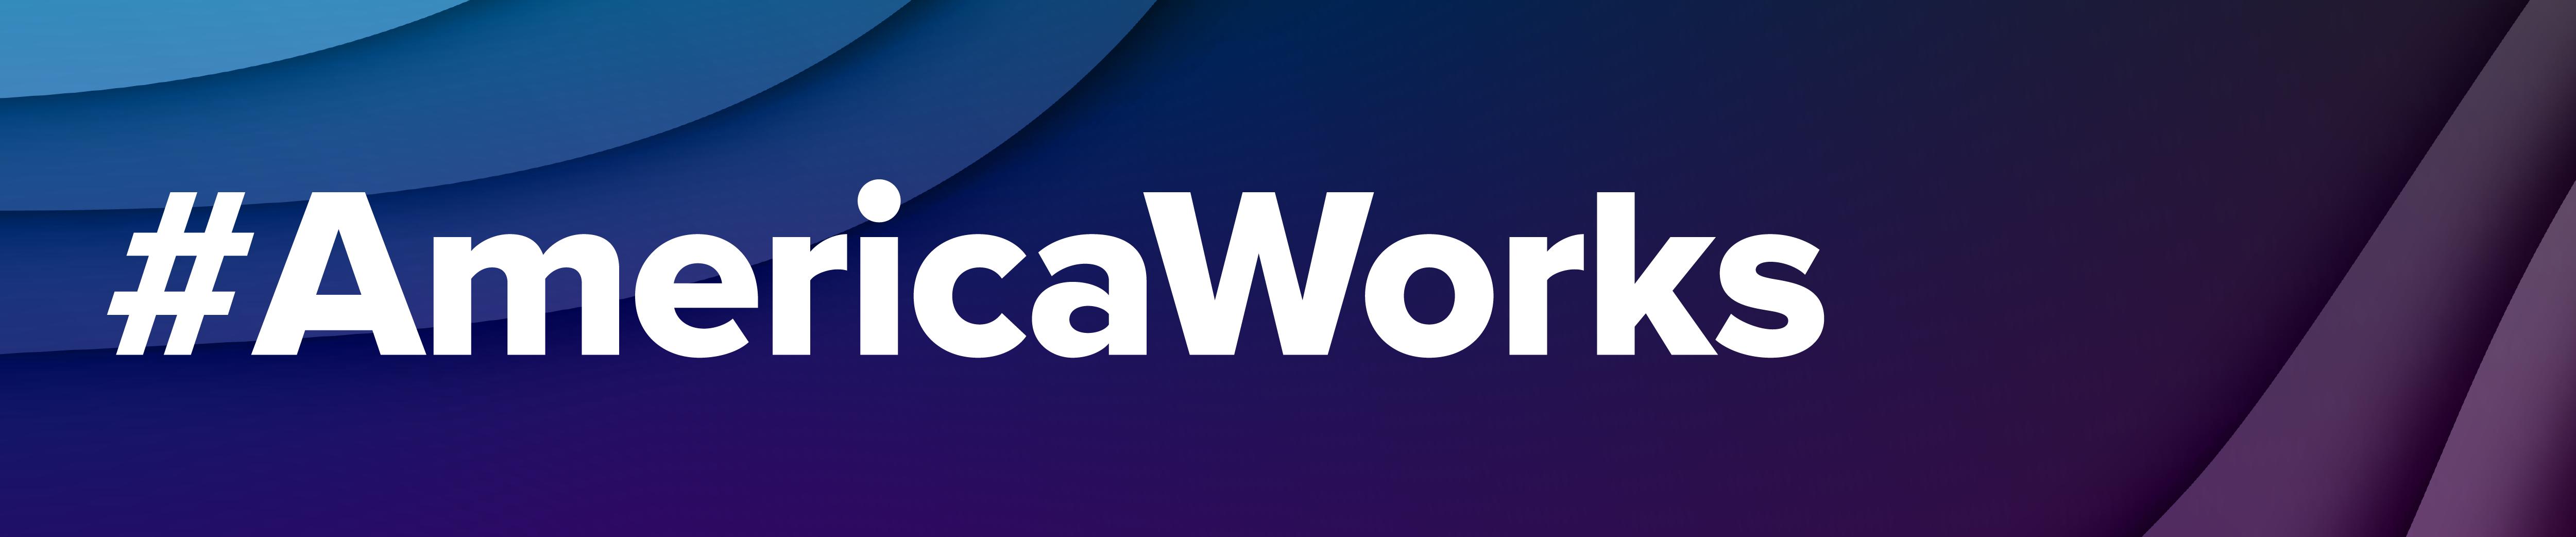 #AmericaWorks